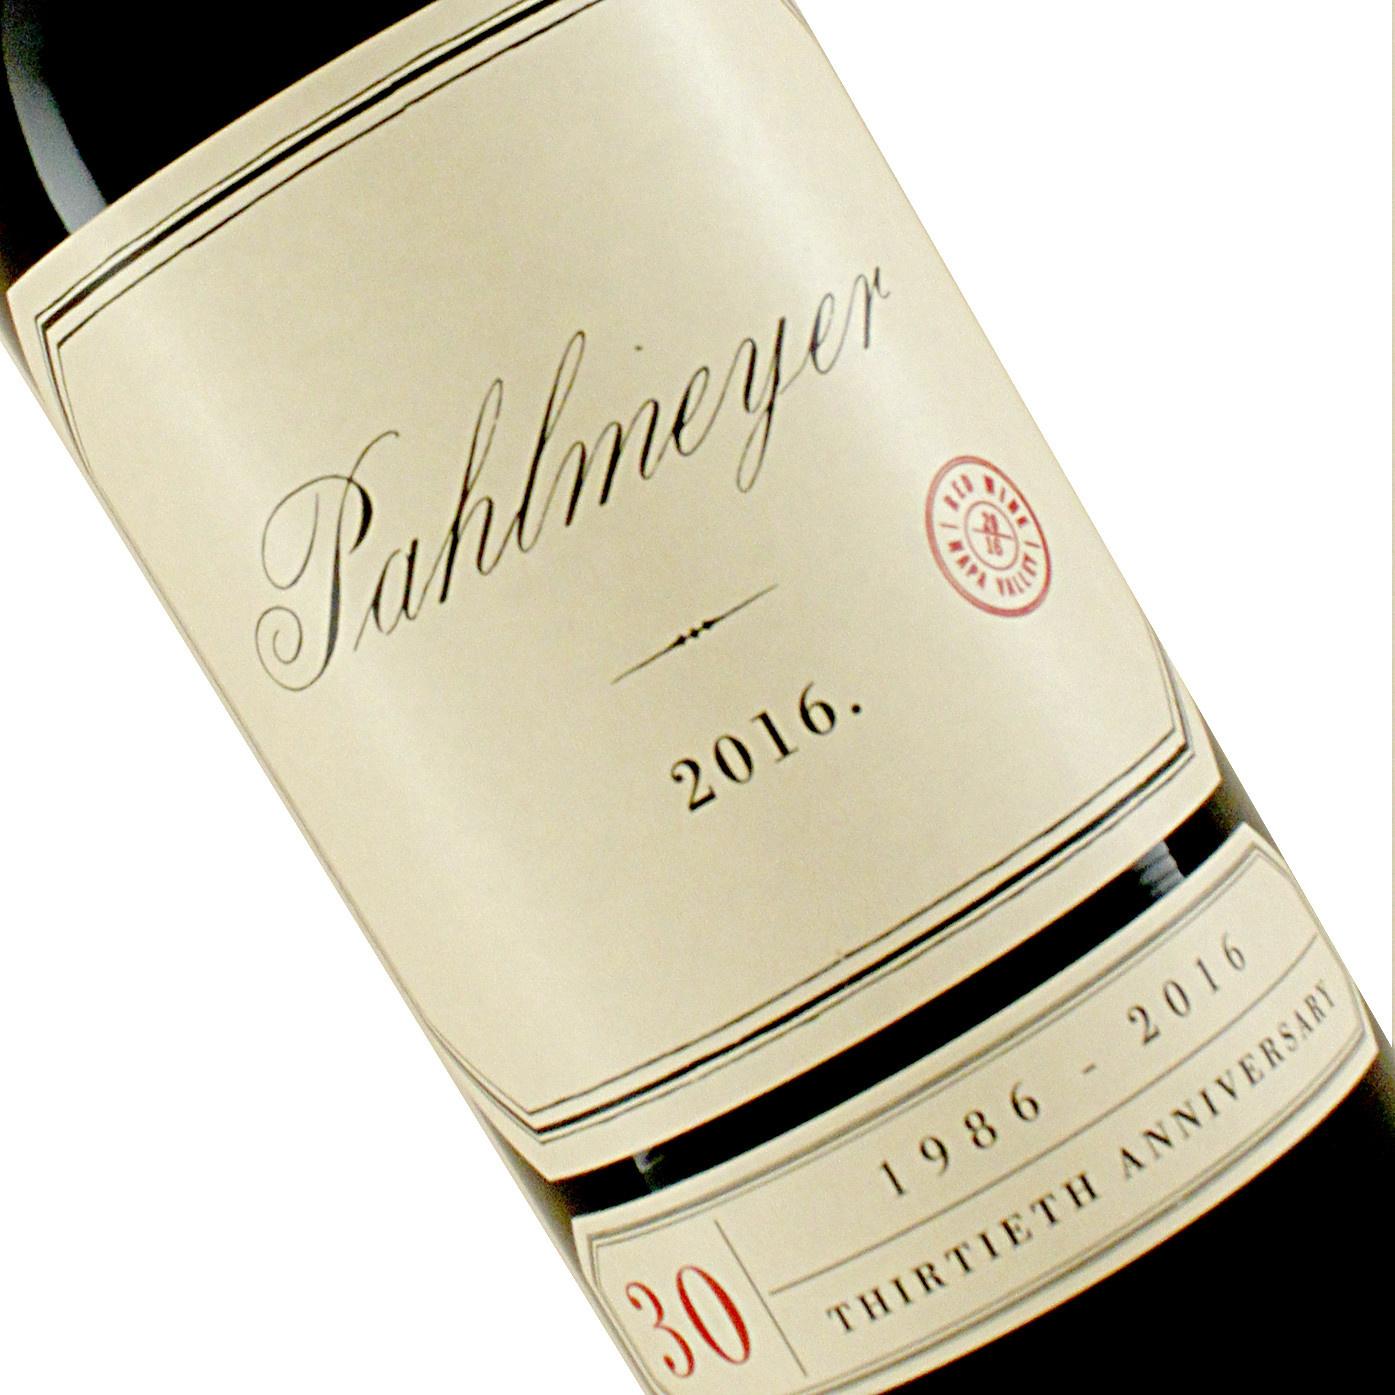 Pahlmeyer 2016 Red Wine Napa Valley Proprietary Blend 30th Anniversary